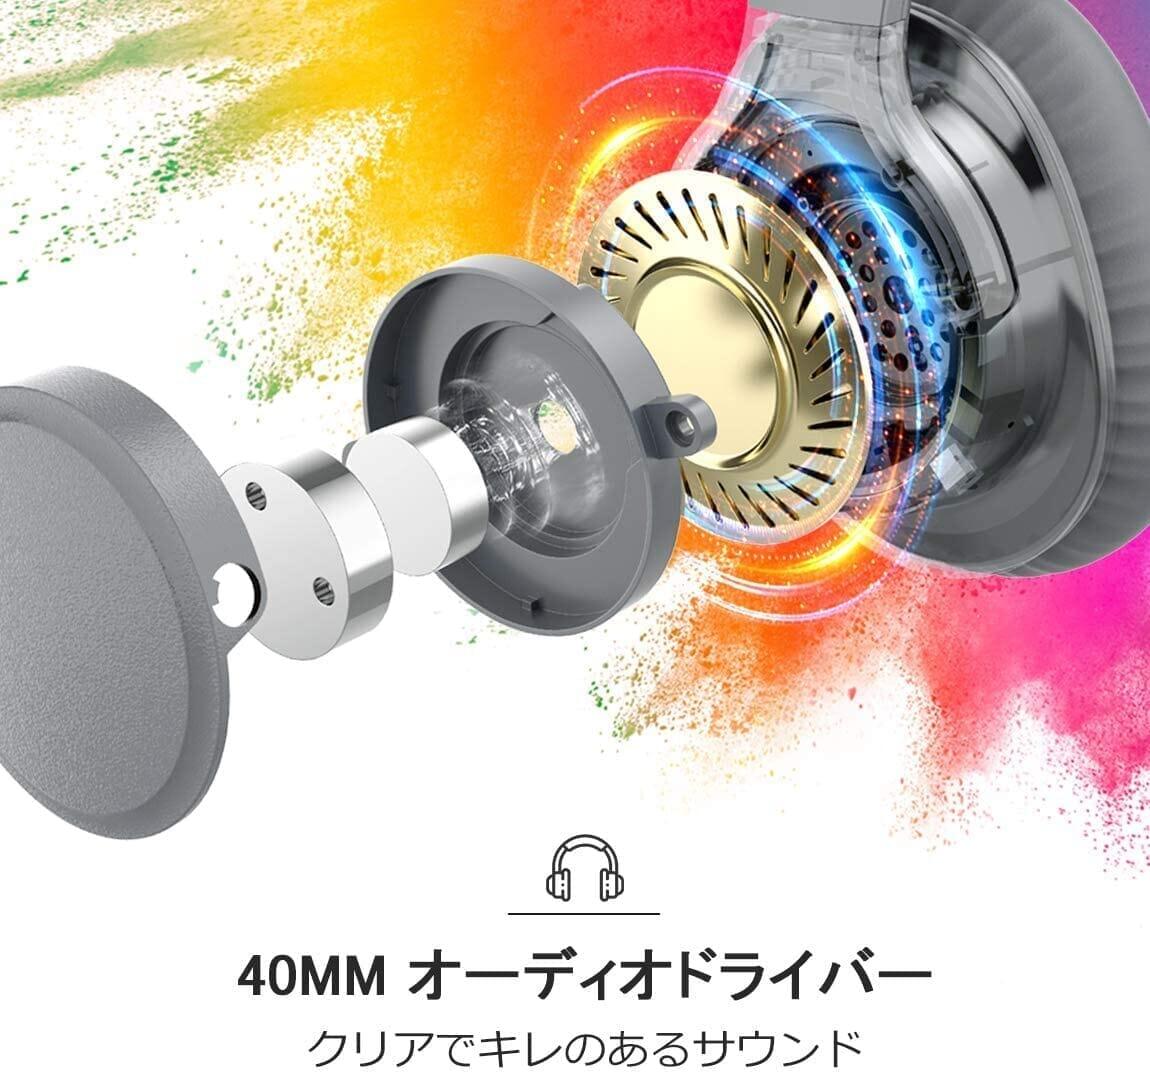 【Mpow H7レビュー】低価格帯の密閉型Bluetoothヘッドホン決定版!40mmドライバーが奏でる高音質サウンドと快適な無線接続を実現させた高コスパヘッドホン|優れているポイント